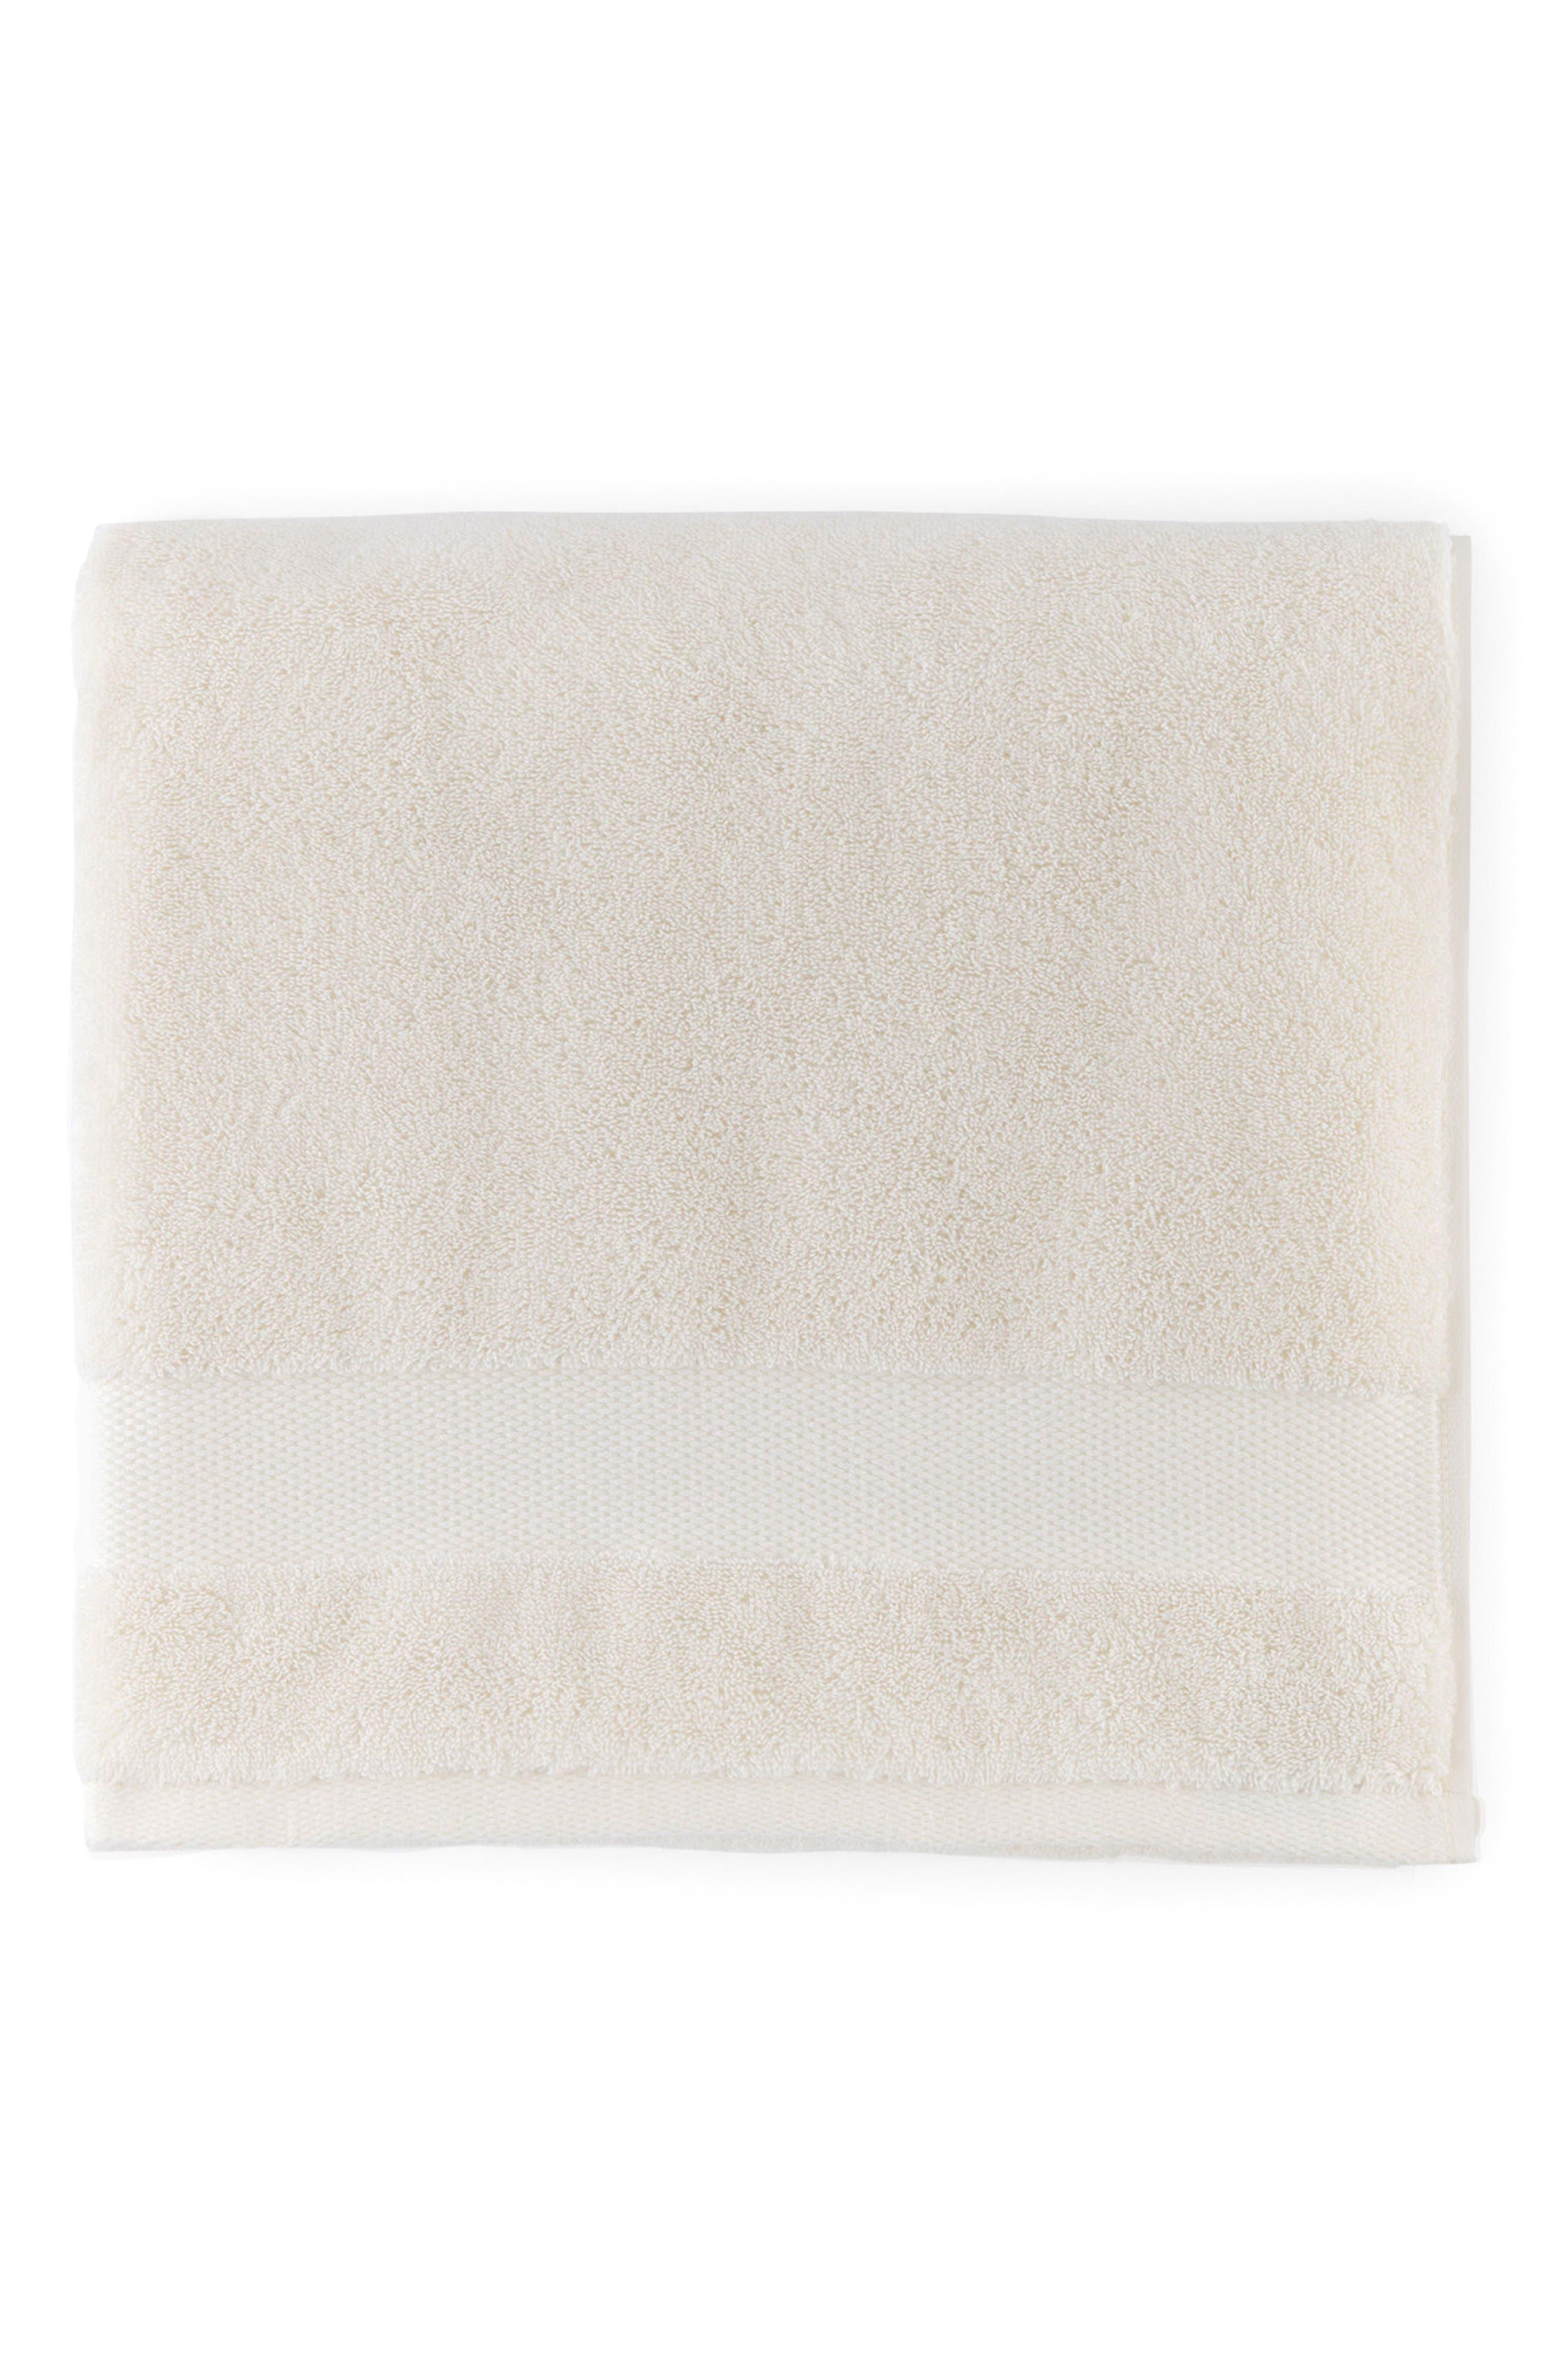 Alternate Image 1 Selected - SFERRA Bello Washcloth